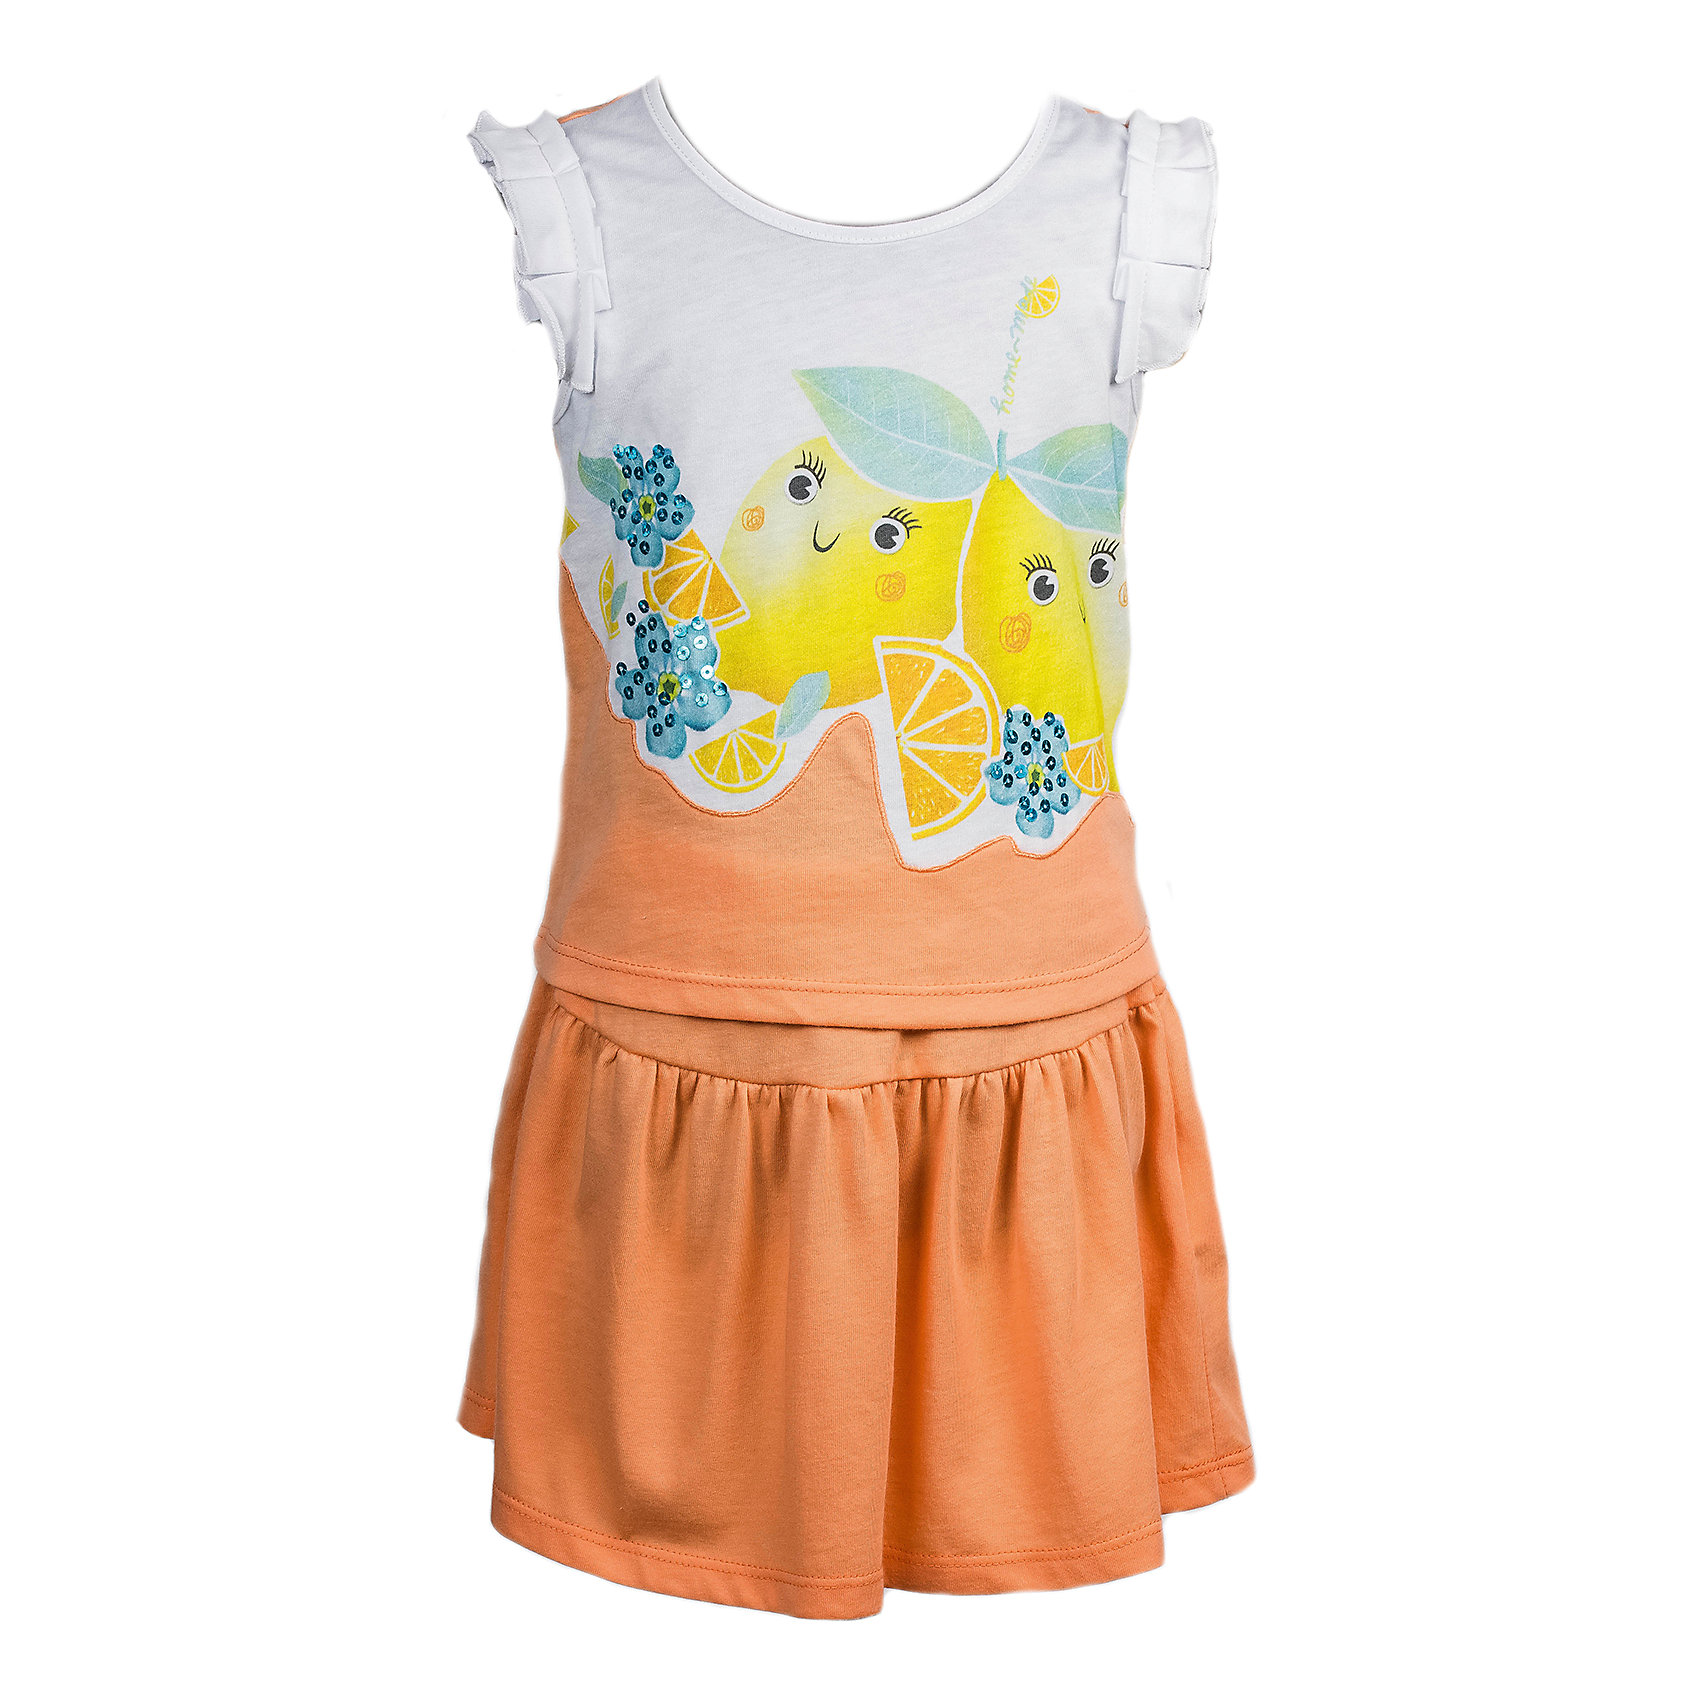 Bell Bimbo Комплект: Футболка и юбка для девочки Bell Bimbo